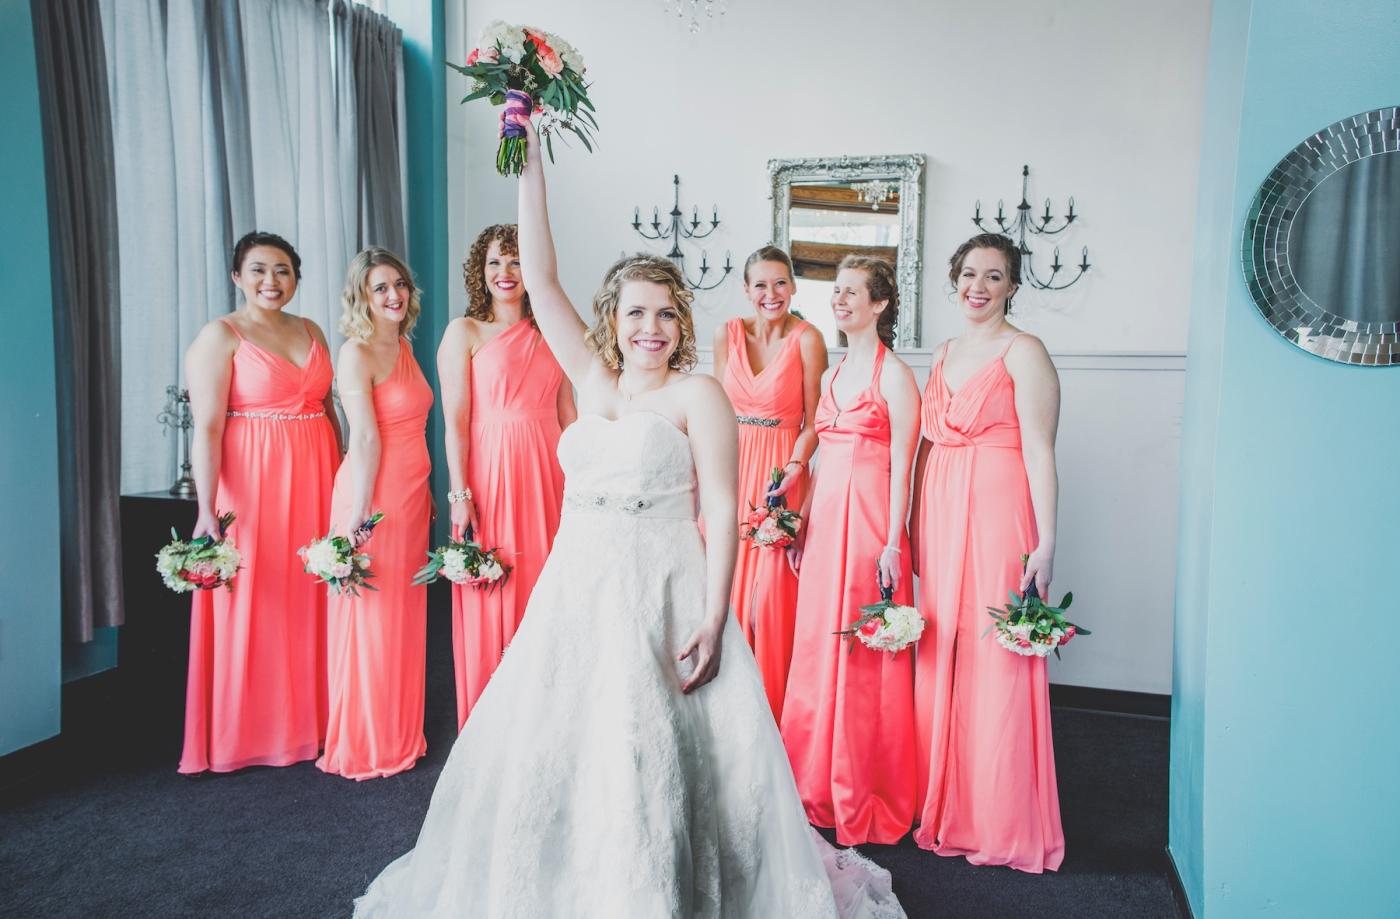 DSC_2448Everett_Wedding_Ballroom_Jane_Speleers_photography_Rachel_and_Edmund_Praying_2017